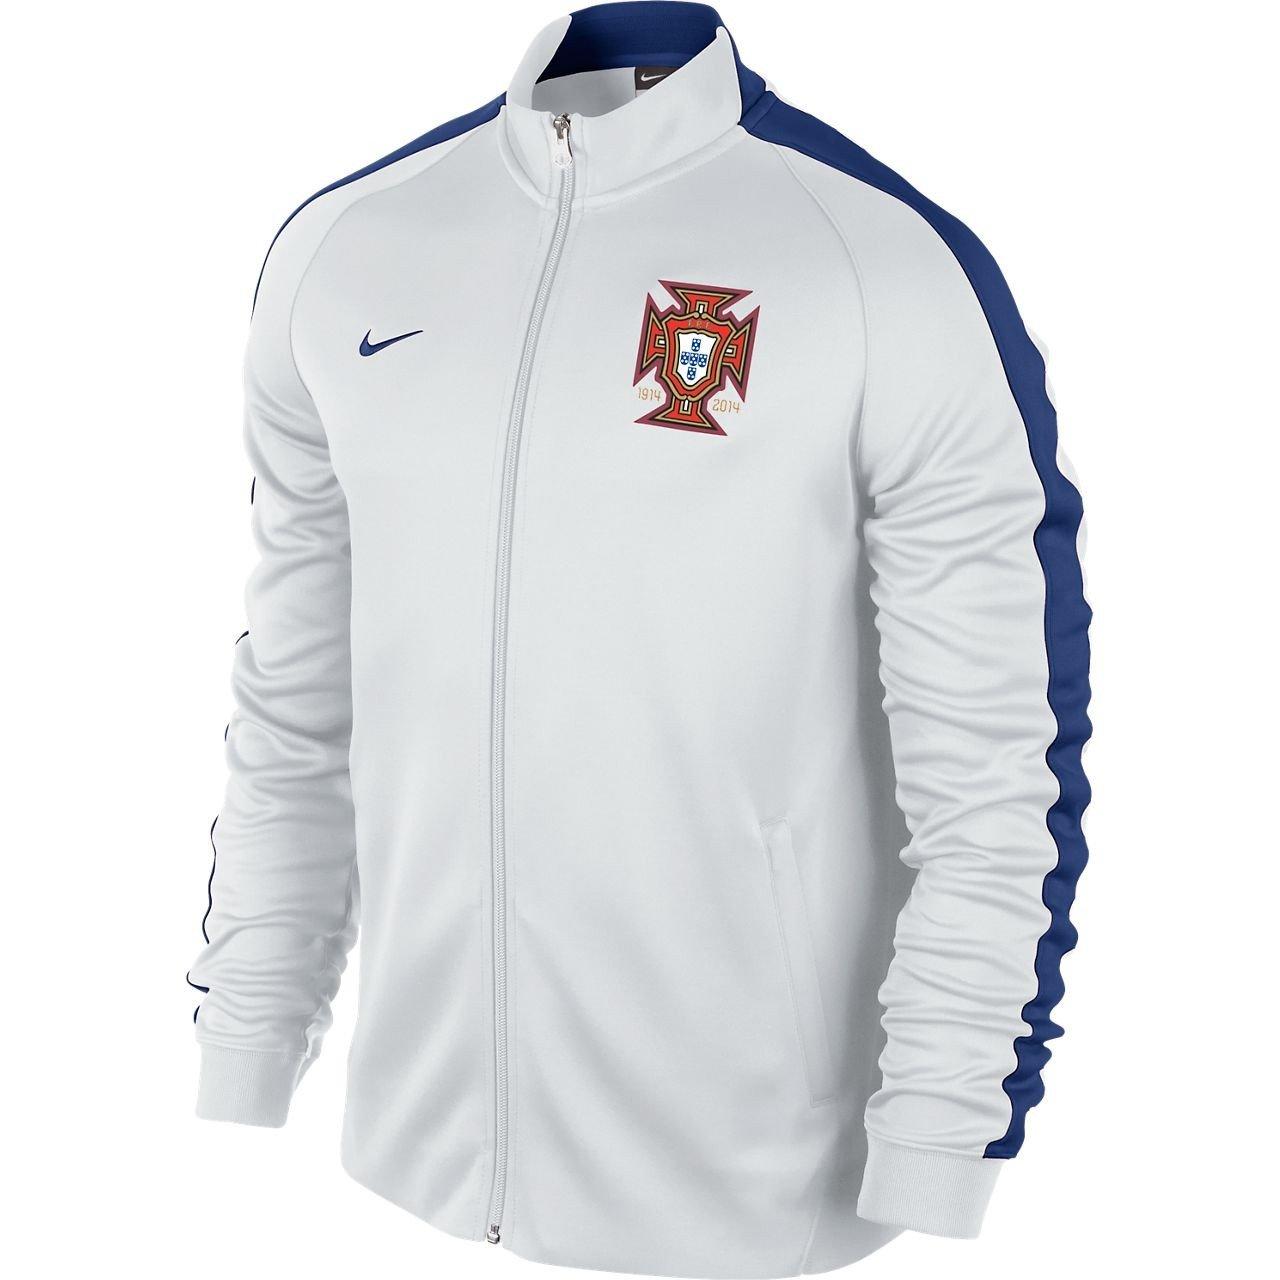 N98 Veste Blanc Portugal Jacket Xl Nike Track Authentic 5HnO8Ux